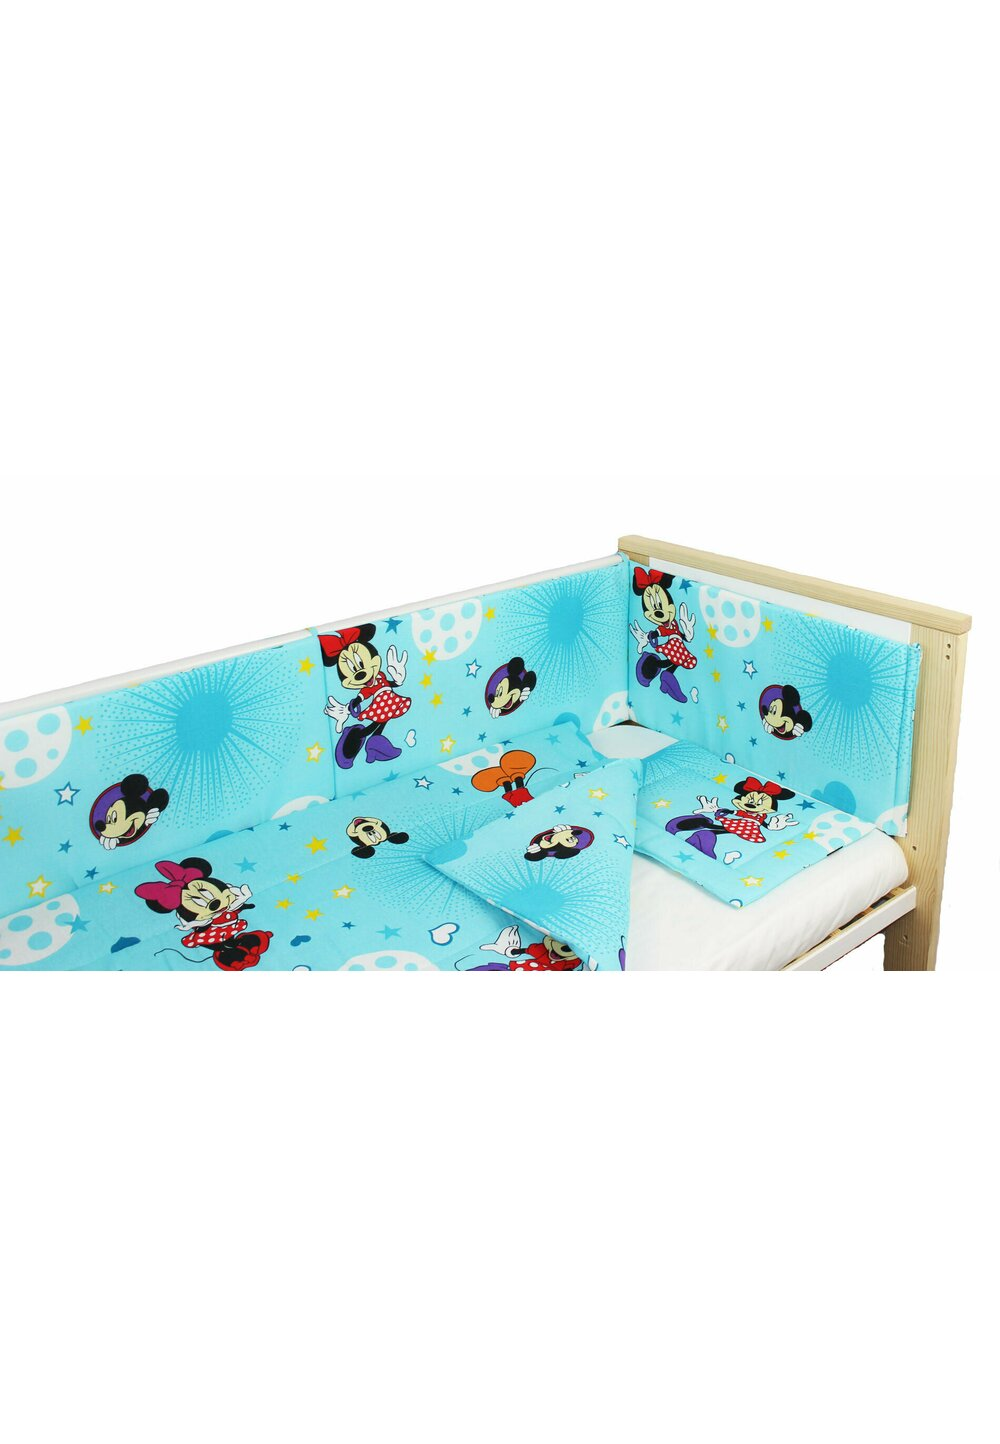 Lenjerie 4 piese, Minnie si Mickey, albastra cu stelute, 120x60cm imagine